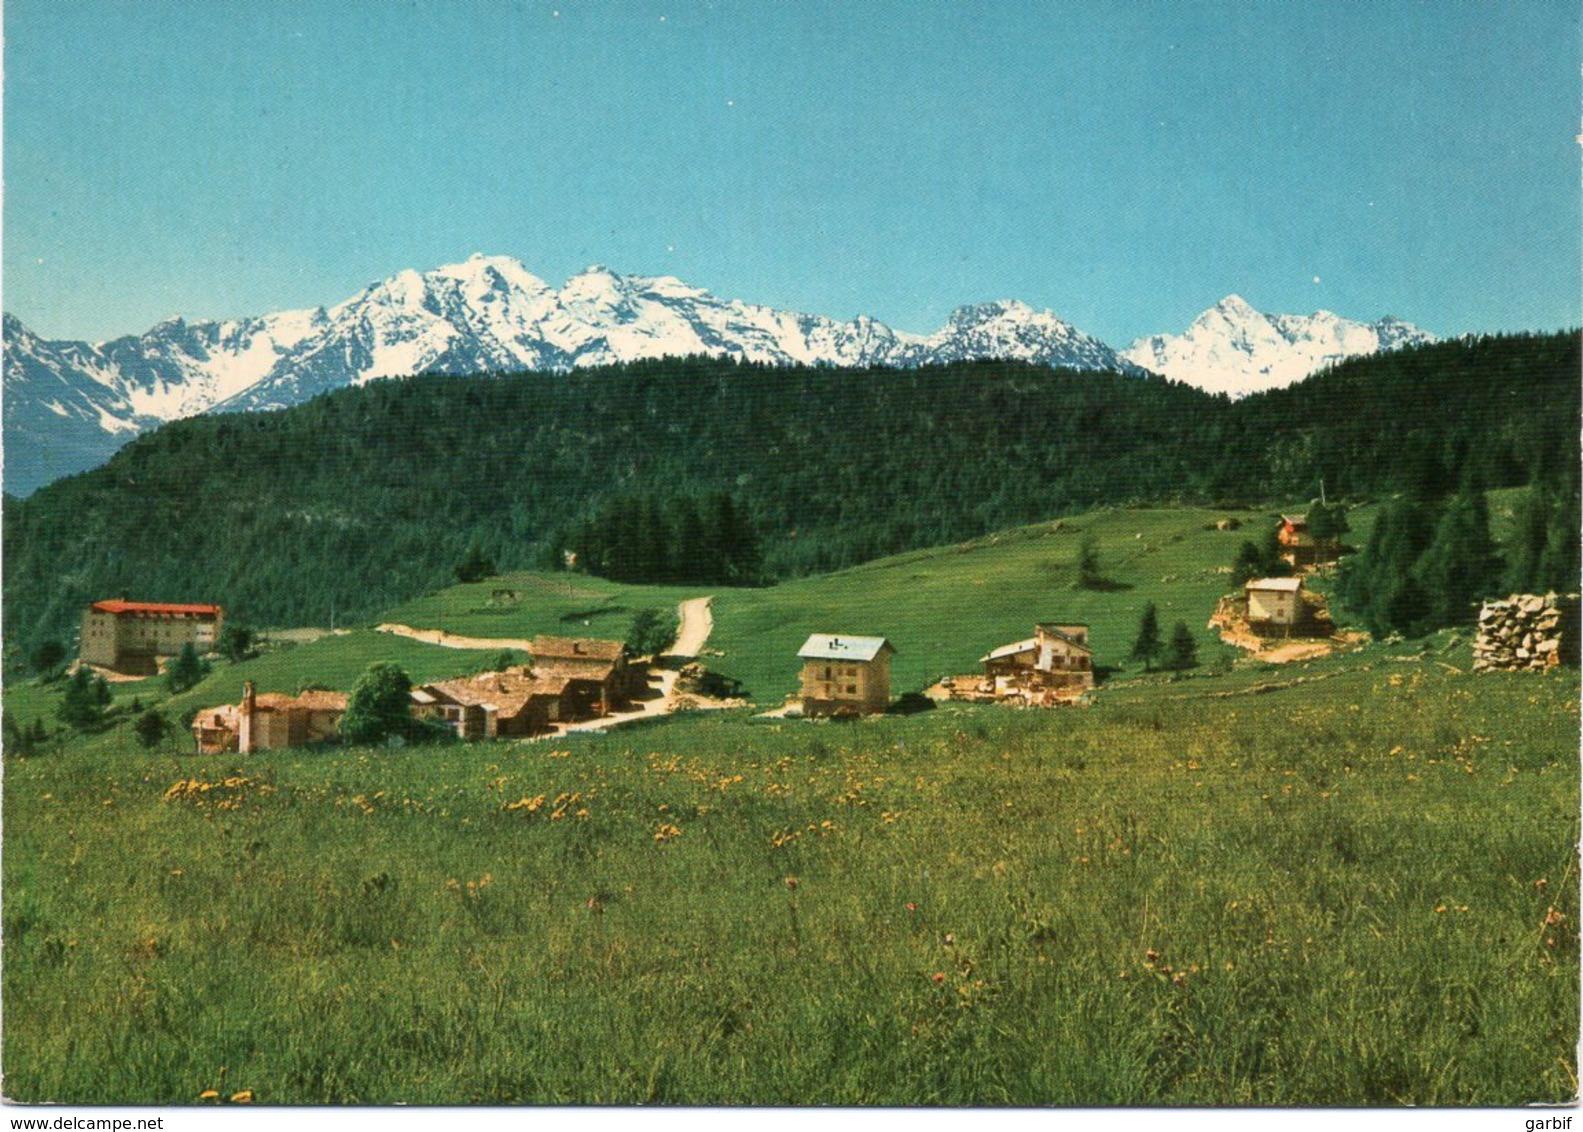 Aosta - Torgnon - Septumiam - Fg Nv - Italy